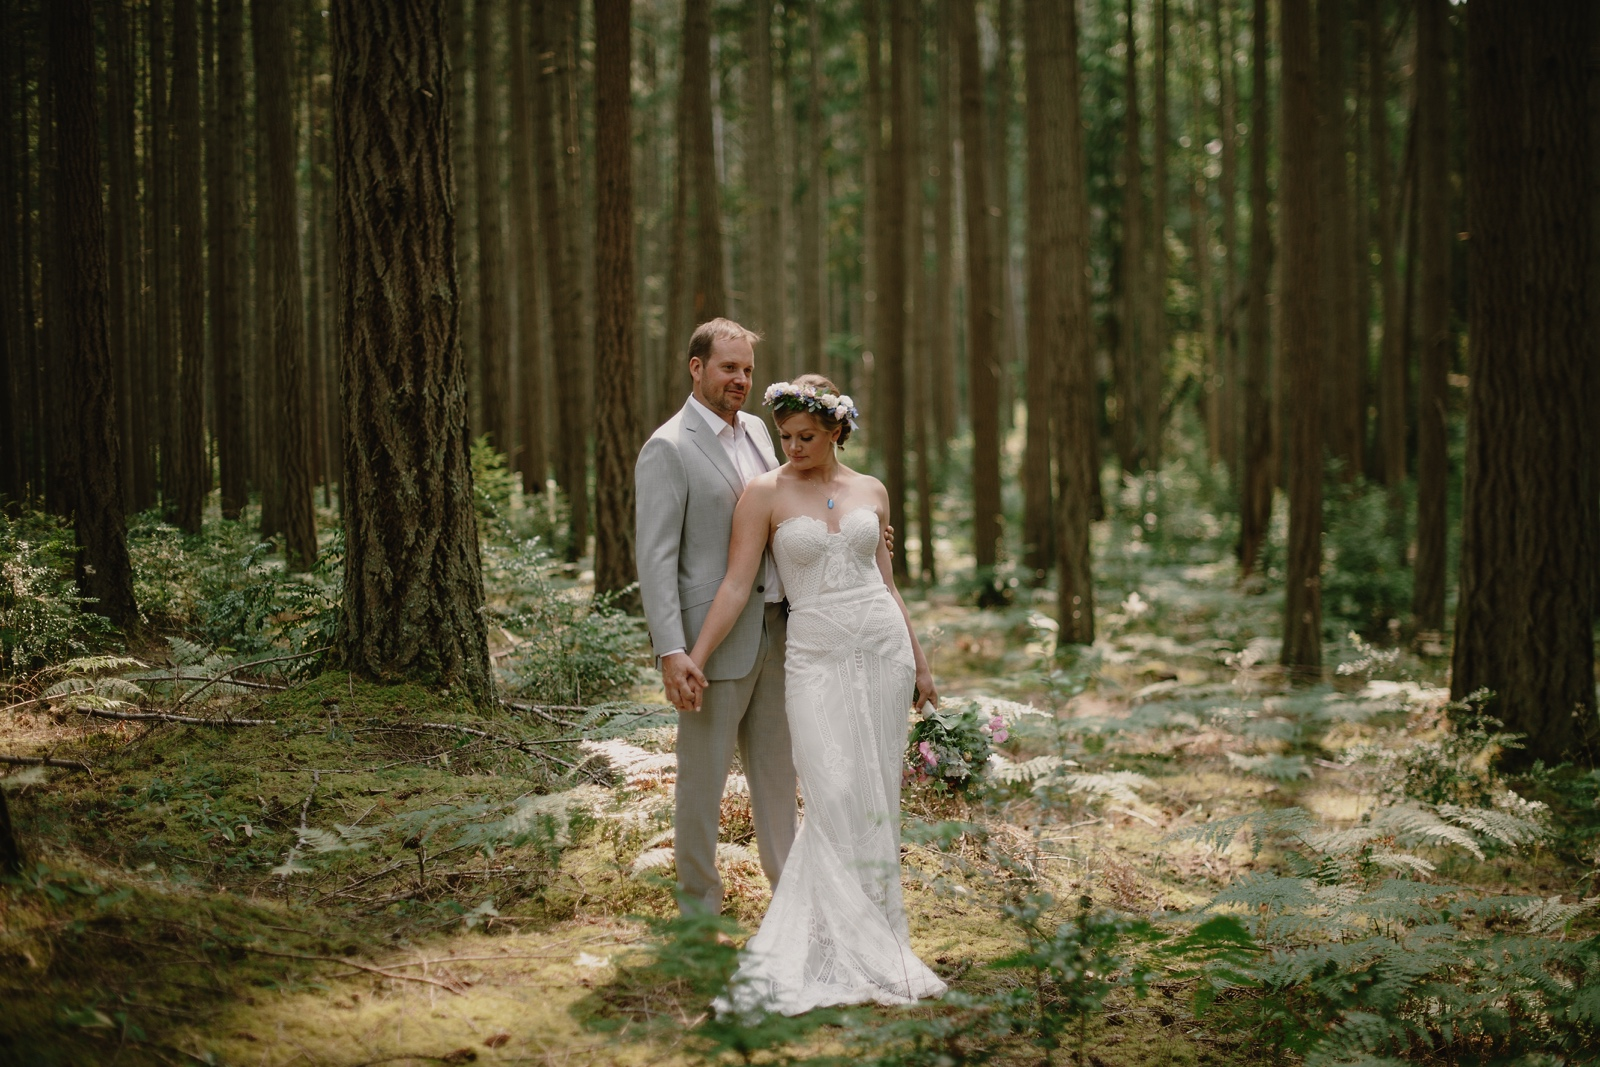 Backyard_Vashon_Island_Wedding_Kristen_Marie_Parker029.JPG